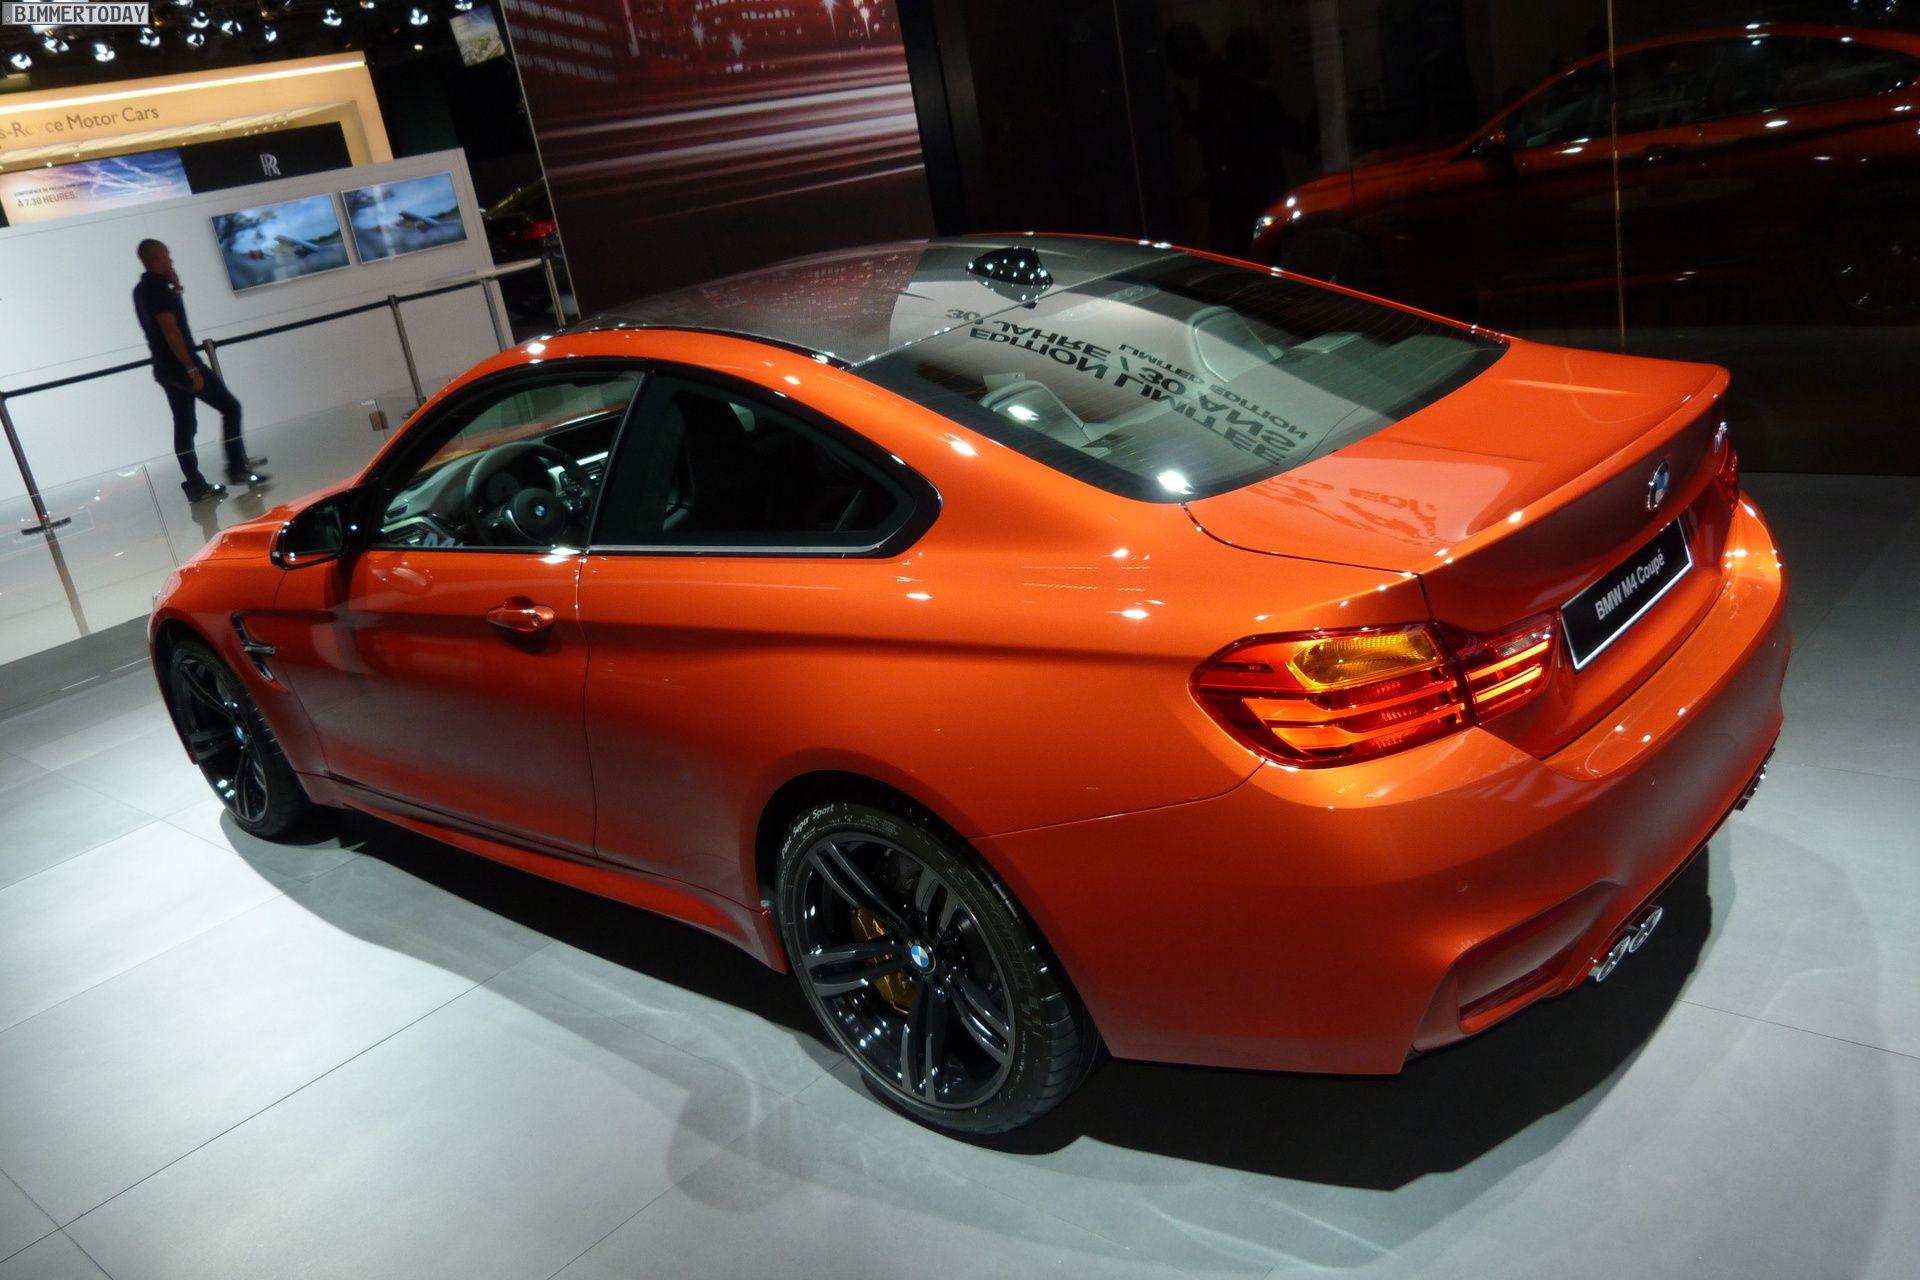 Bmw M Sakhir BMWMCoupeFSakhirOrangeAutosalon - 2014 bmw m4 msrp